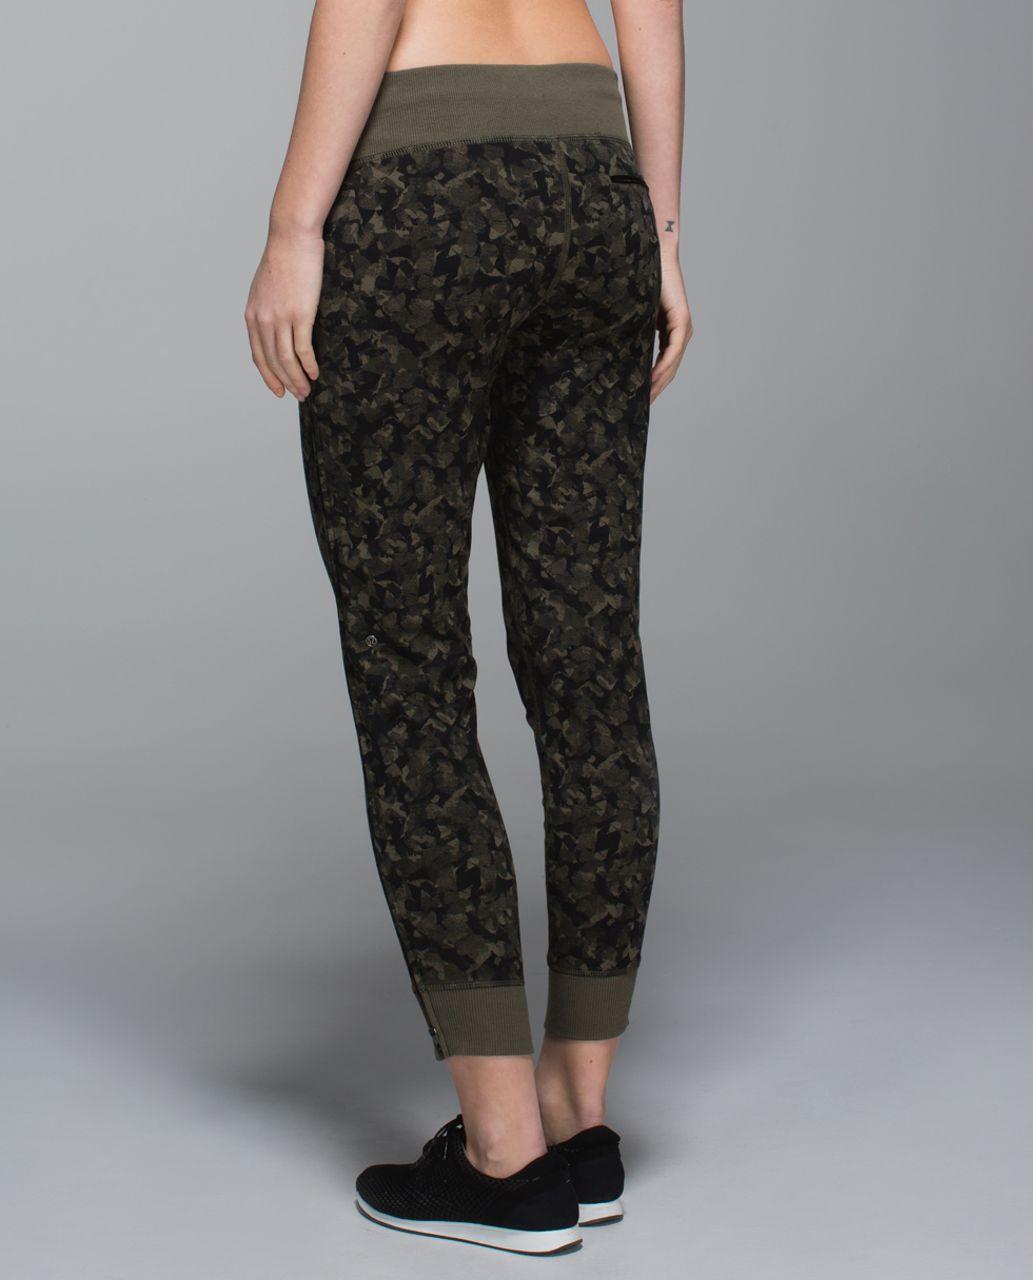 Lululemon No Sweat Pant - Mystic Jungle Fatigue Green Black / Fatigue Green